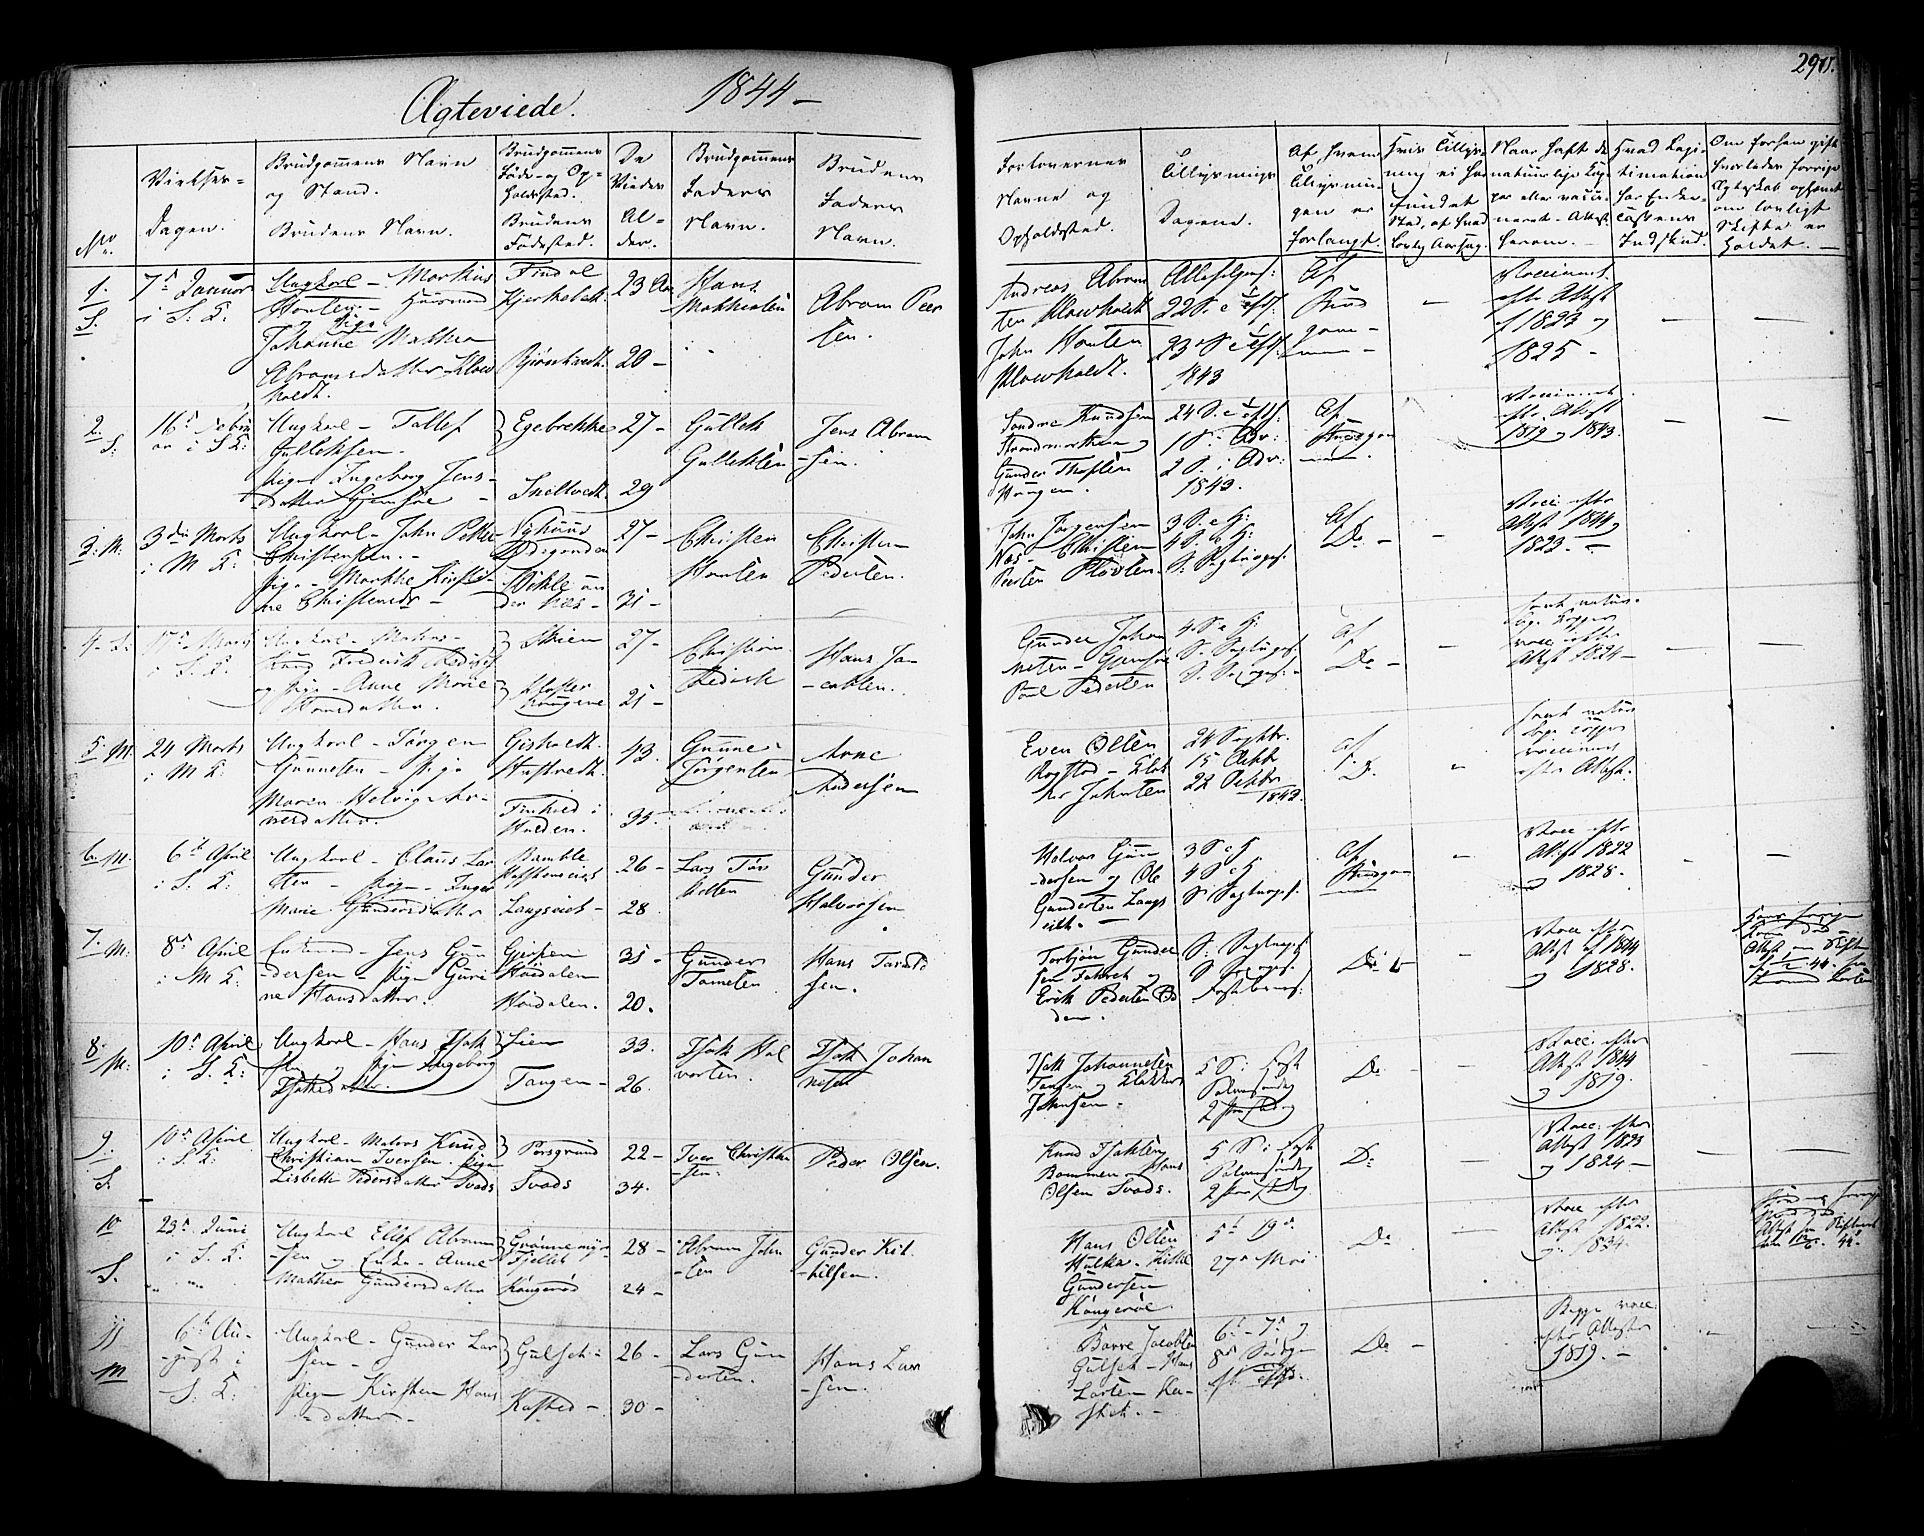 SAKO, Solum kirkebøker, F/Fa/L0006: Ministerialbok nr. I 6, 1844-1855, s. 290